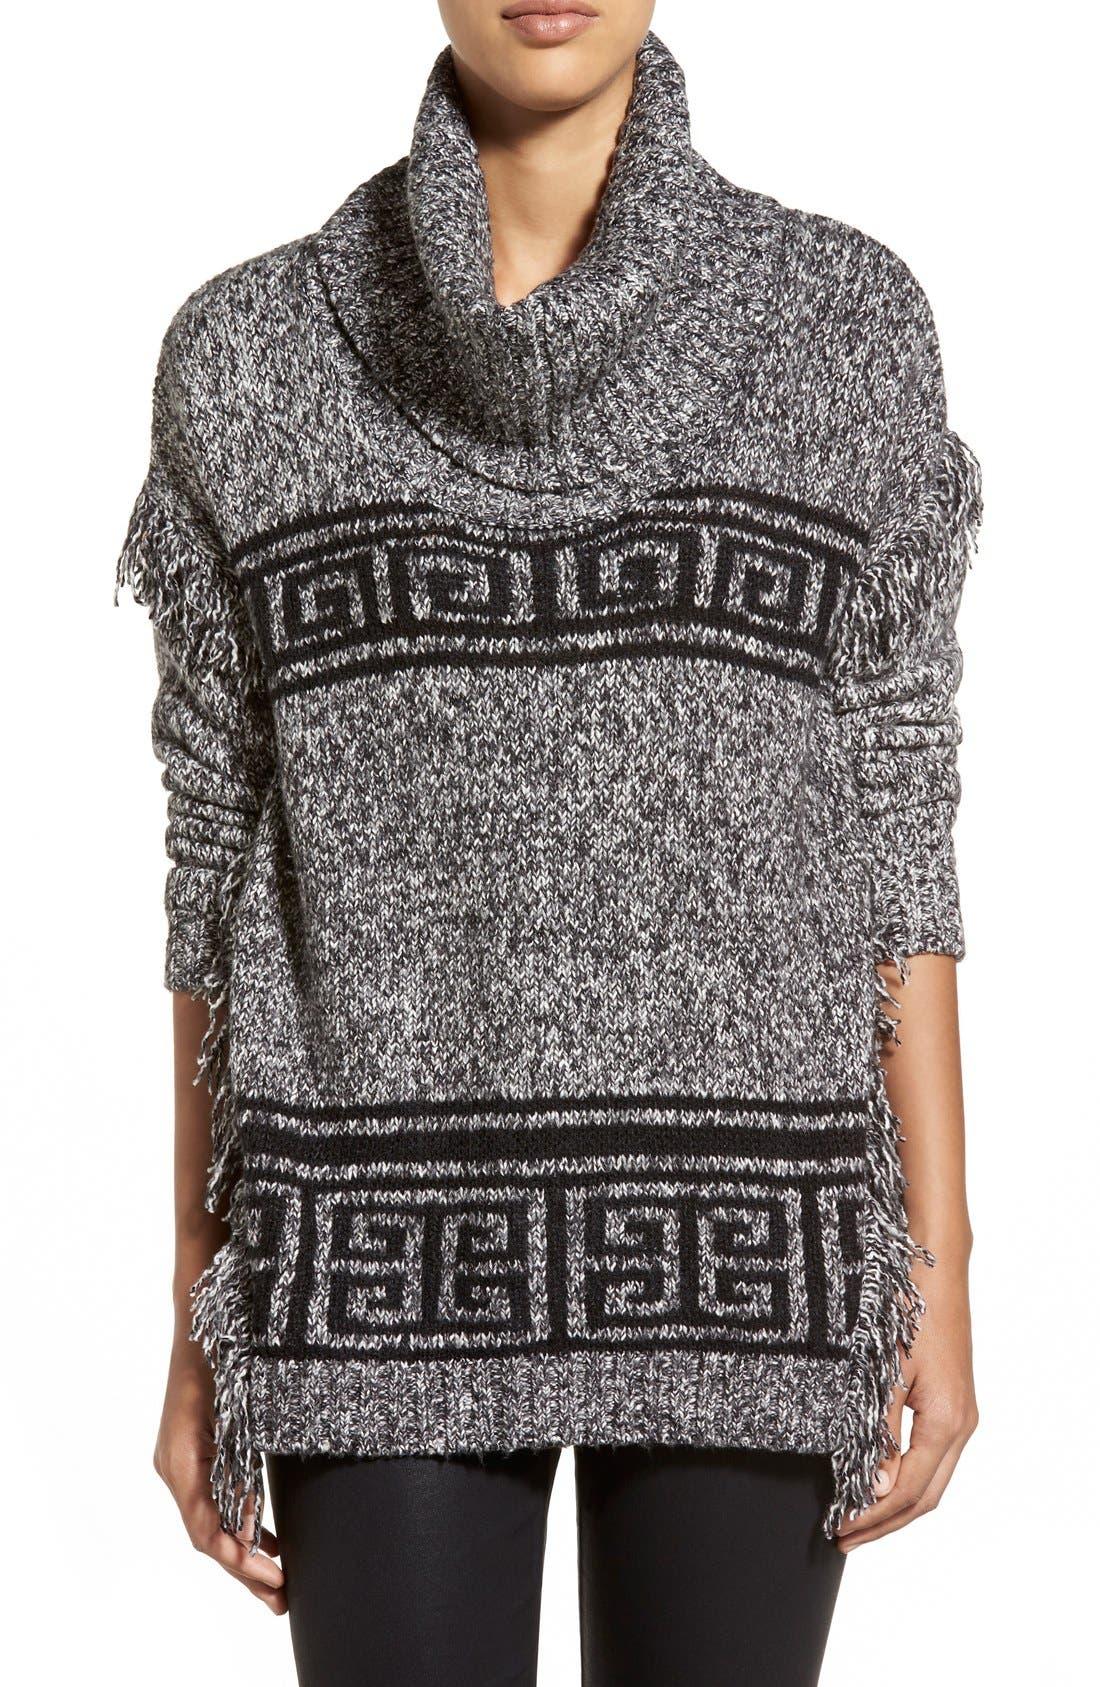 Main Image - kensie Fringe Trim Turtleneck Sweater